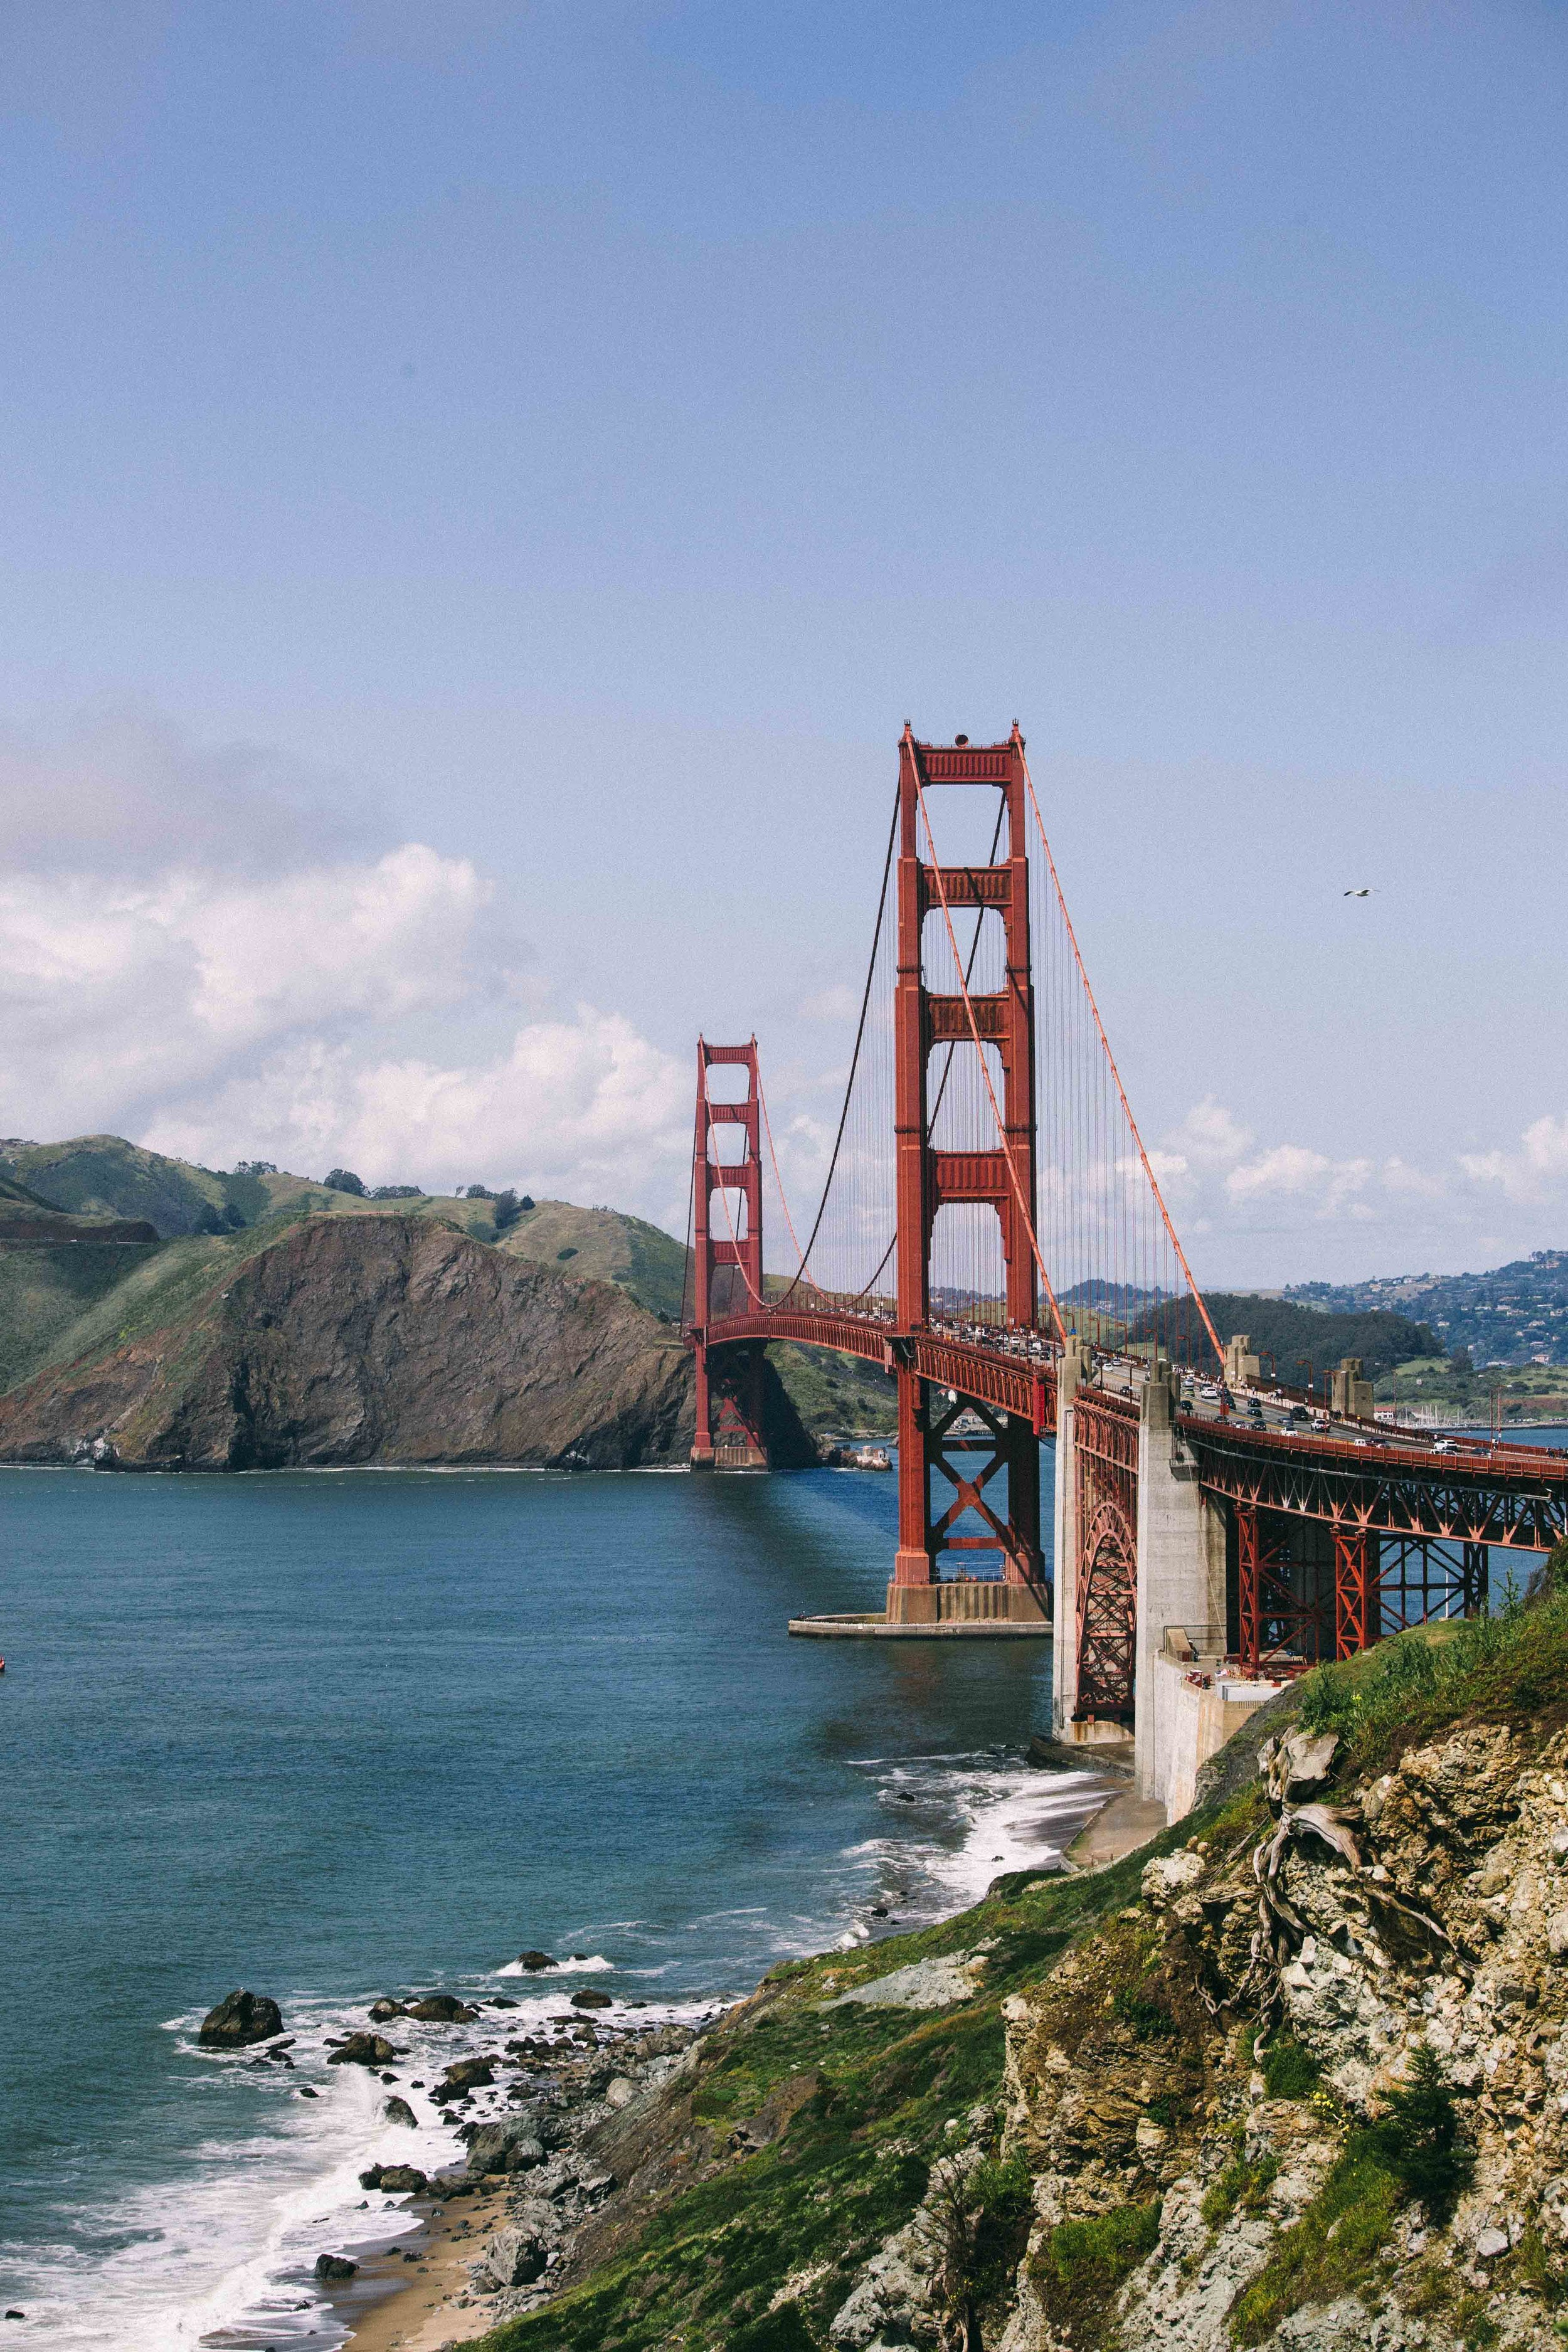 More crazy view of the Golden Gate Bridge. Photo: Marine Raynard